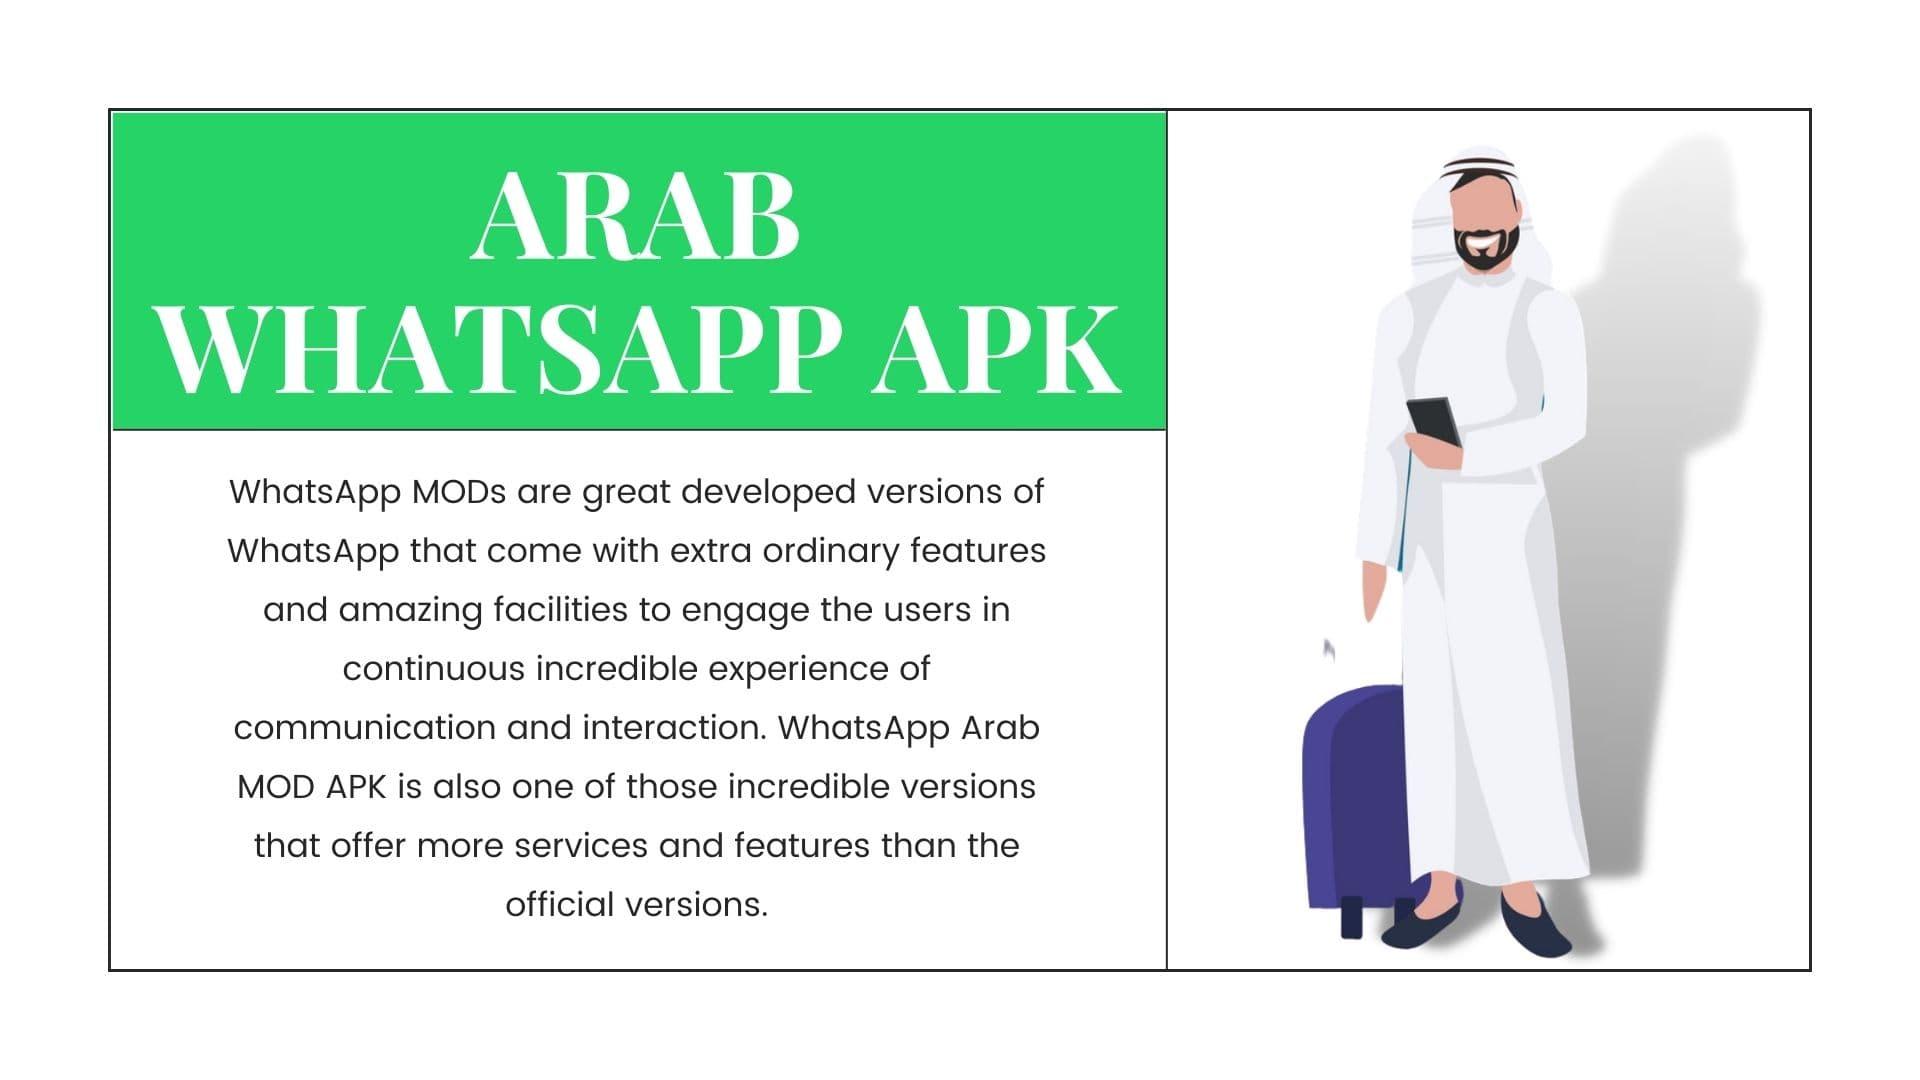 Arab WhatsApp APK